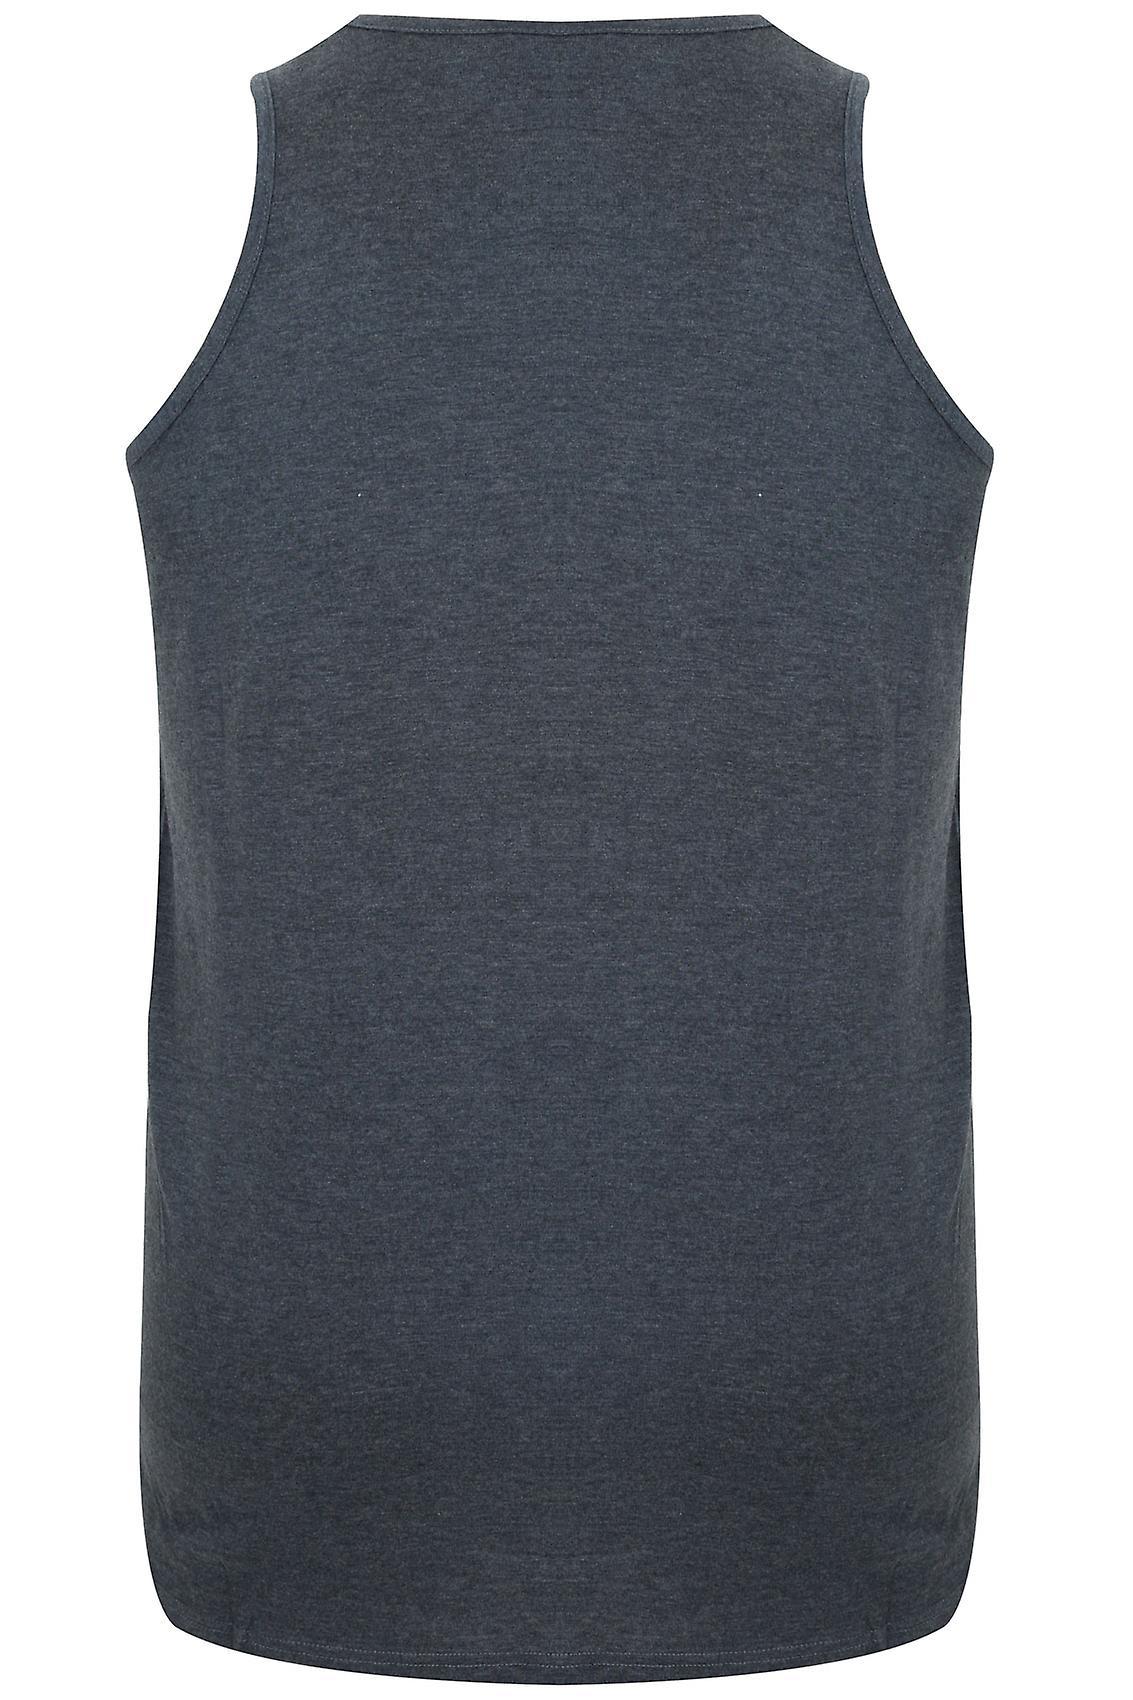 D555 Charcoal Marl Crew Neck Vest